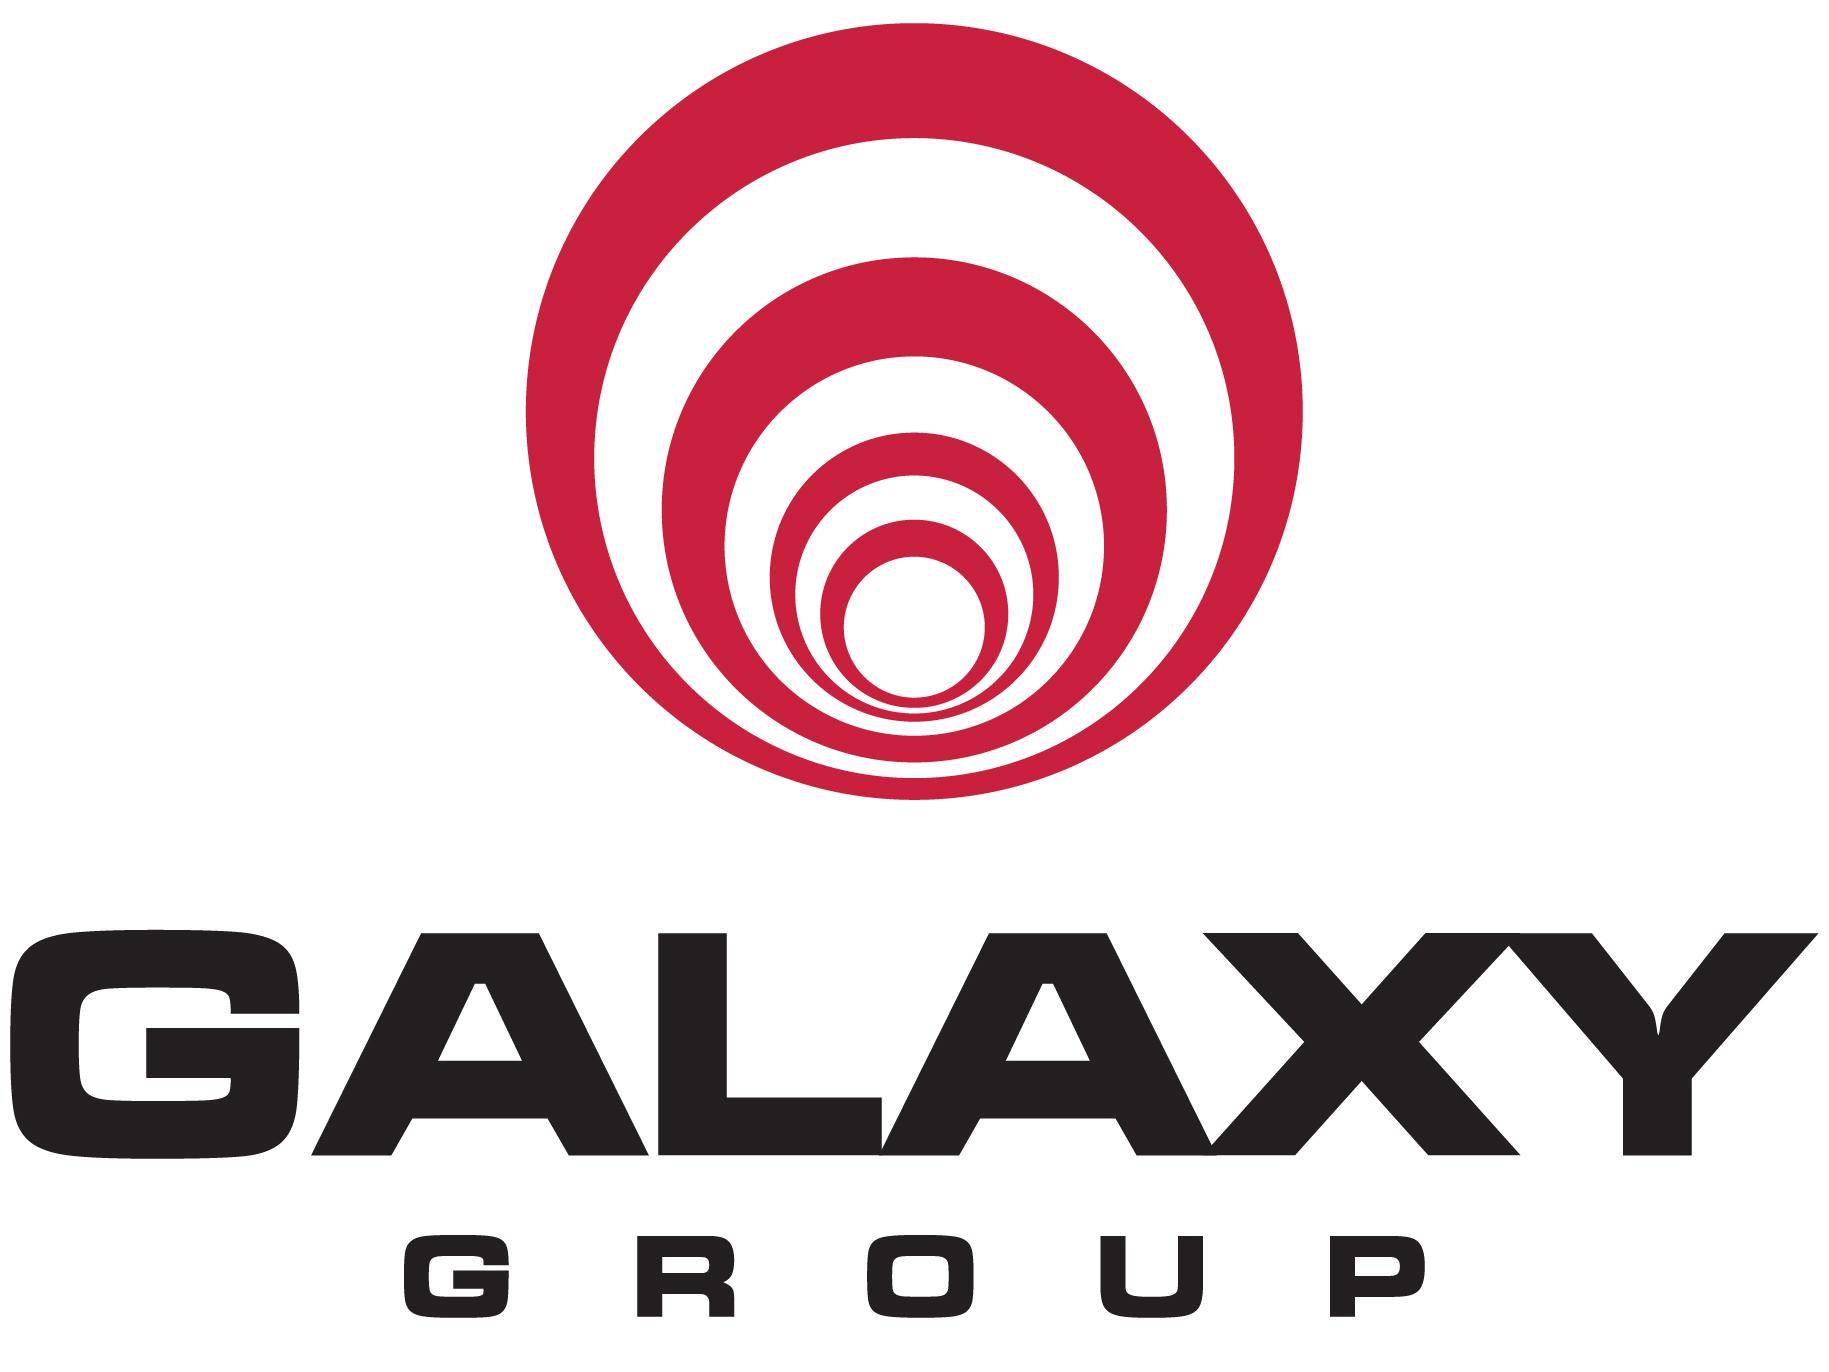 Застройщик Galaxy Group